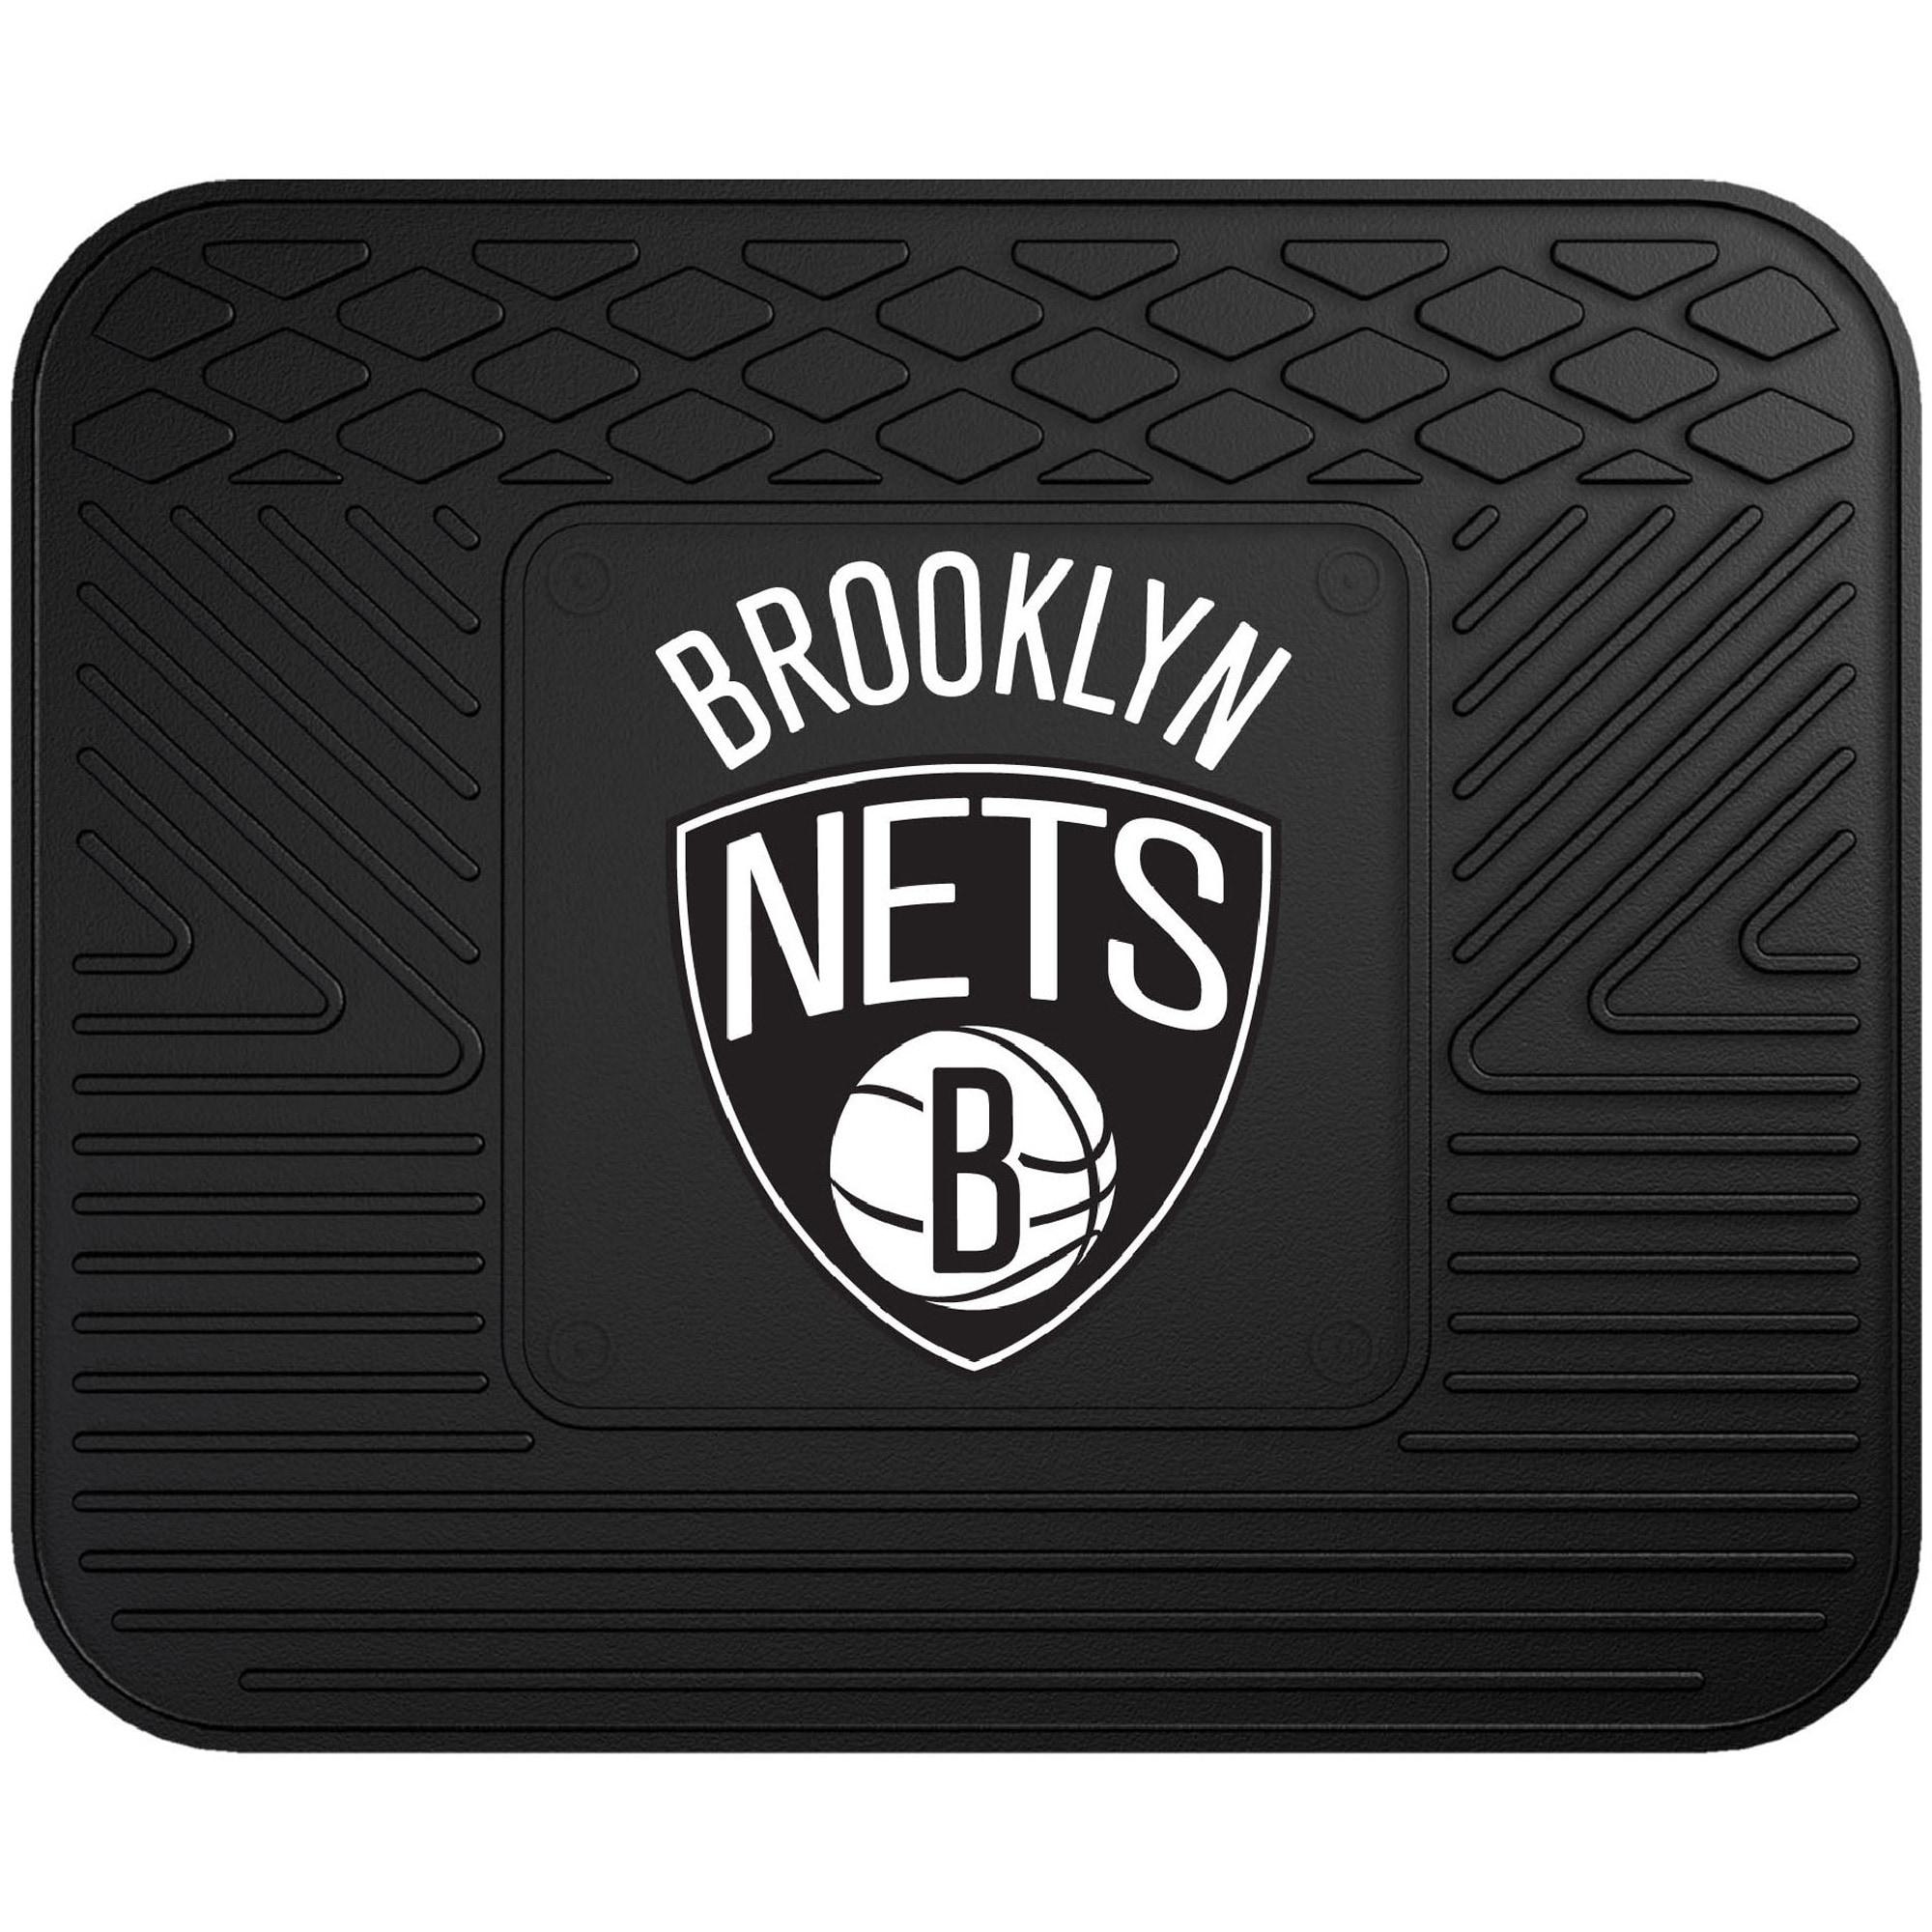 "Brooklyn Nets 17"" x 14"" Utility Mat"